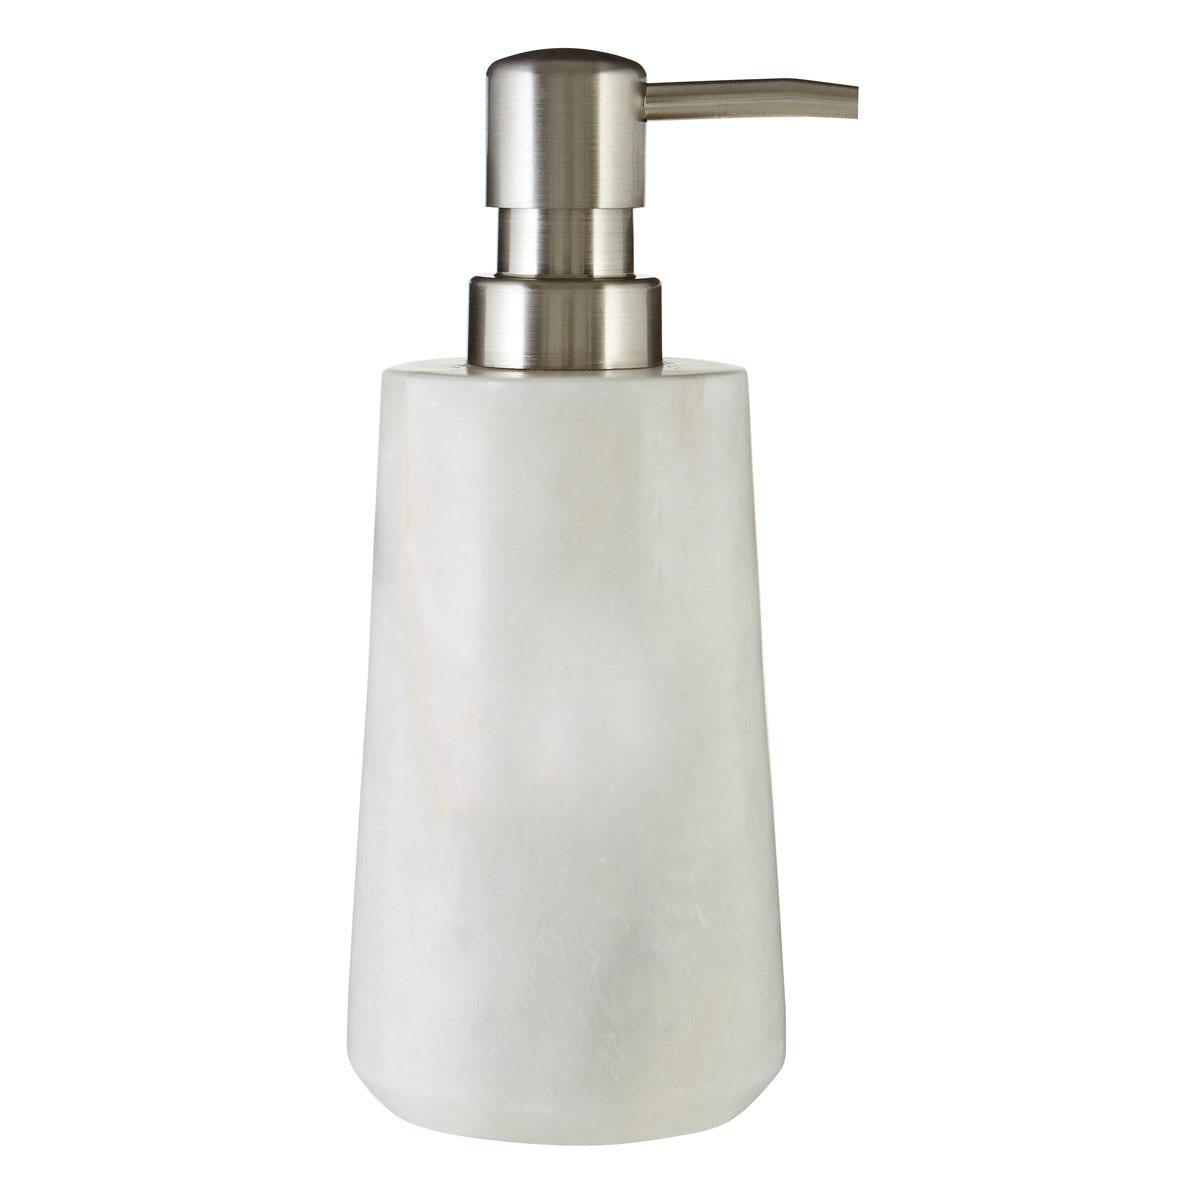 Mode White Marble Soap Dispenser Victoriaplum Com